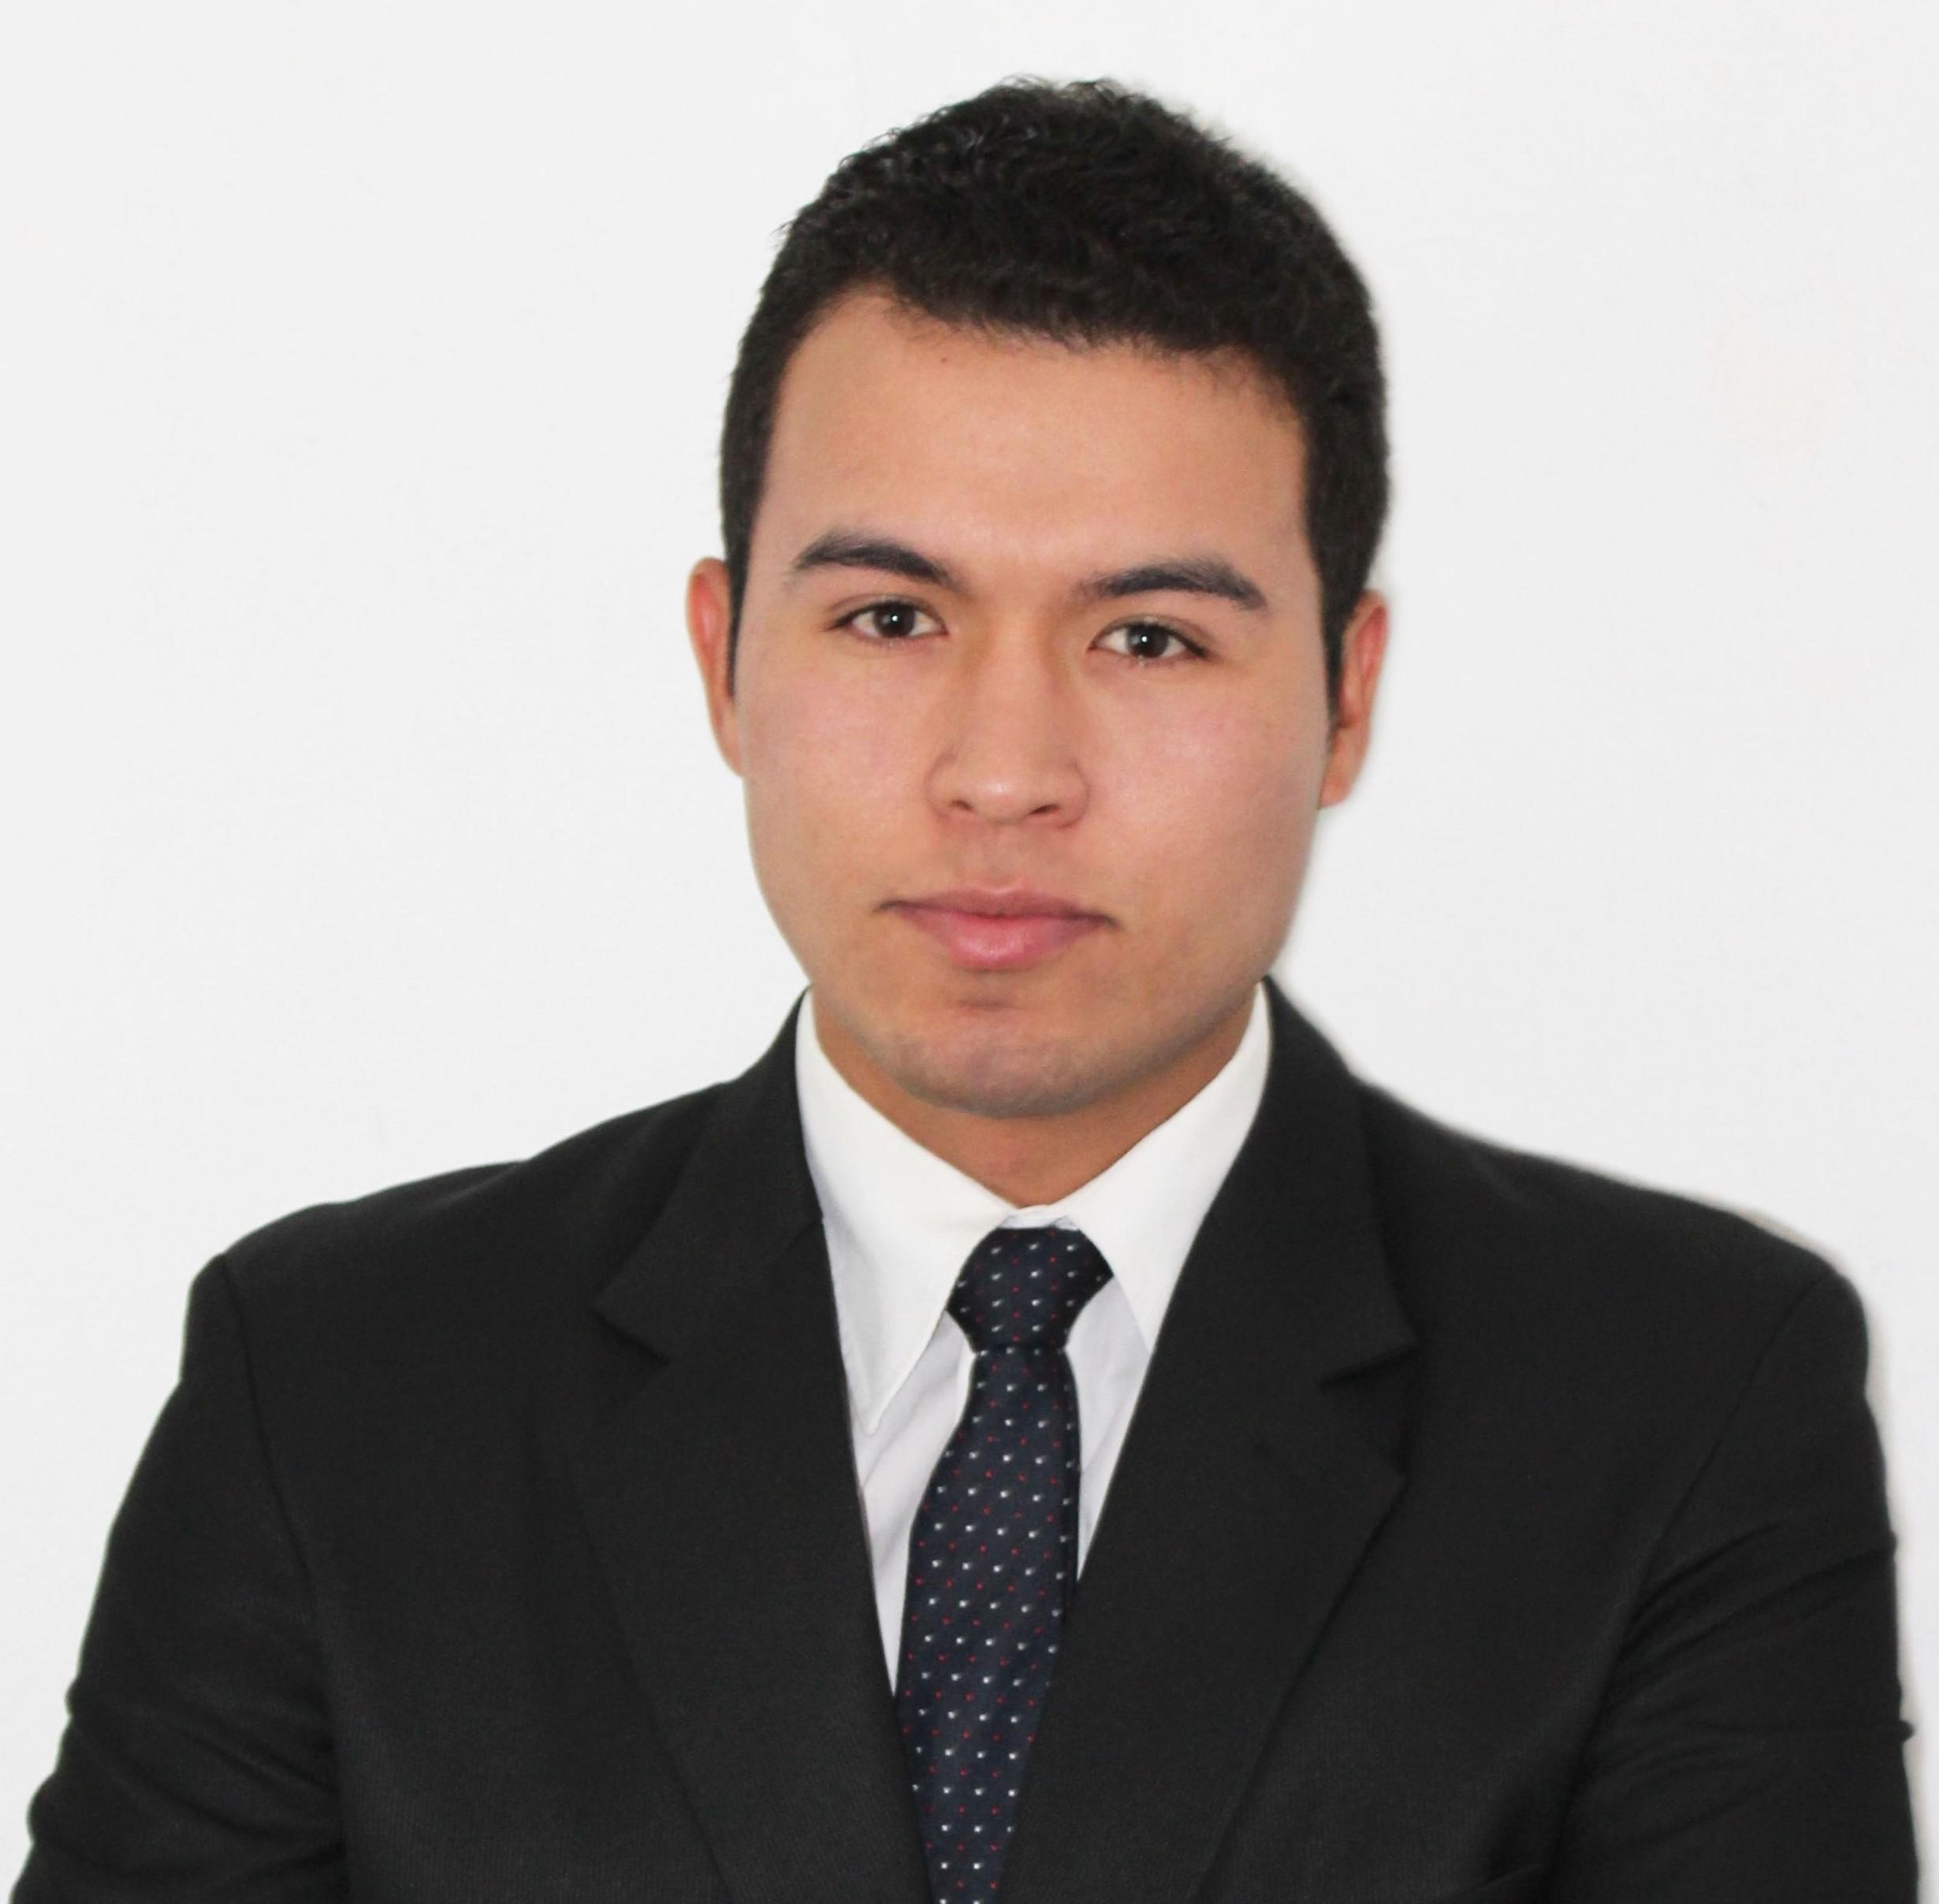 José Díaz Valdivia